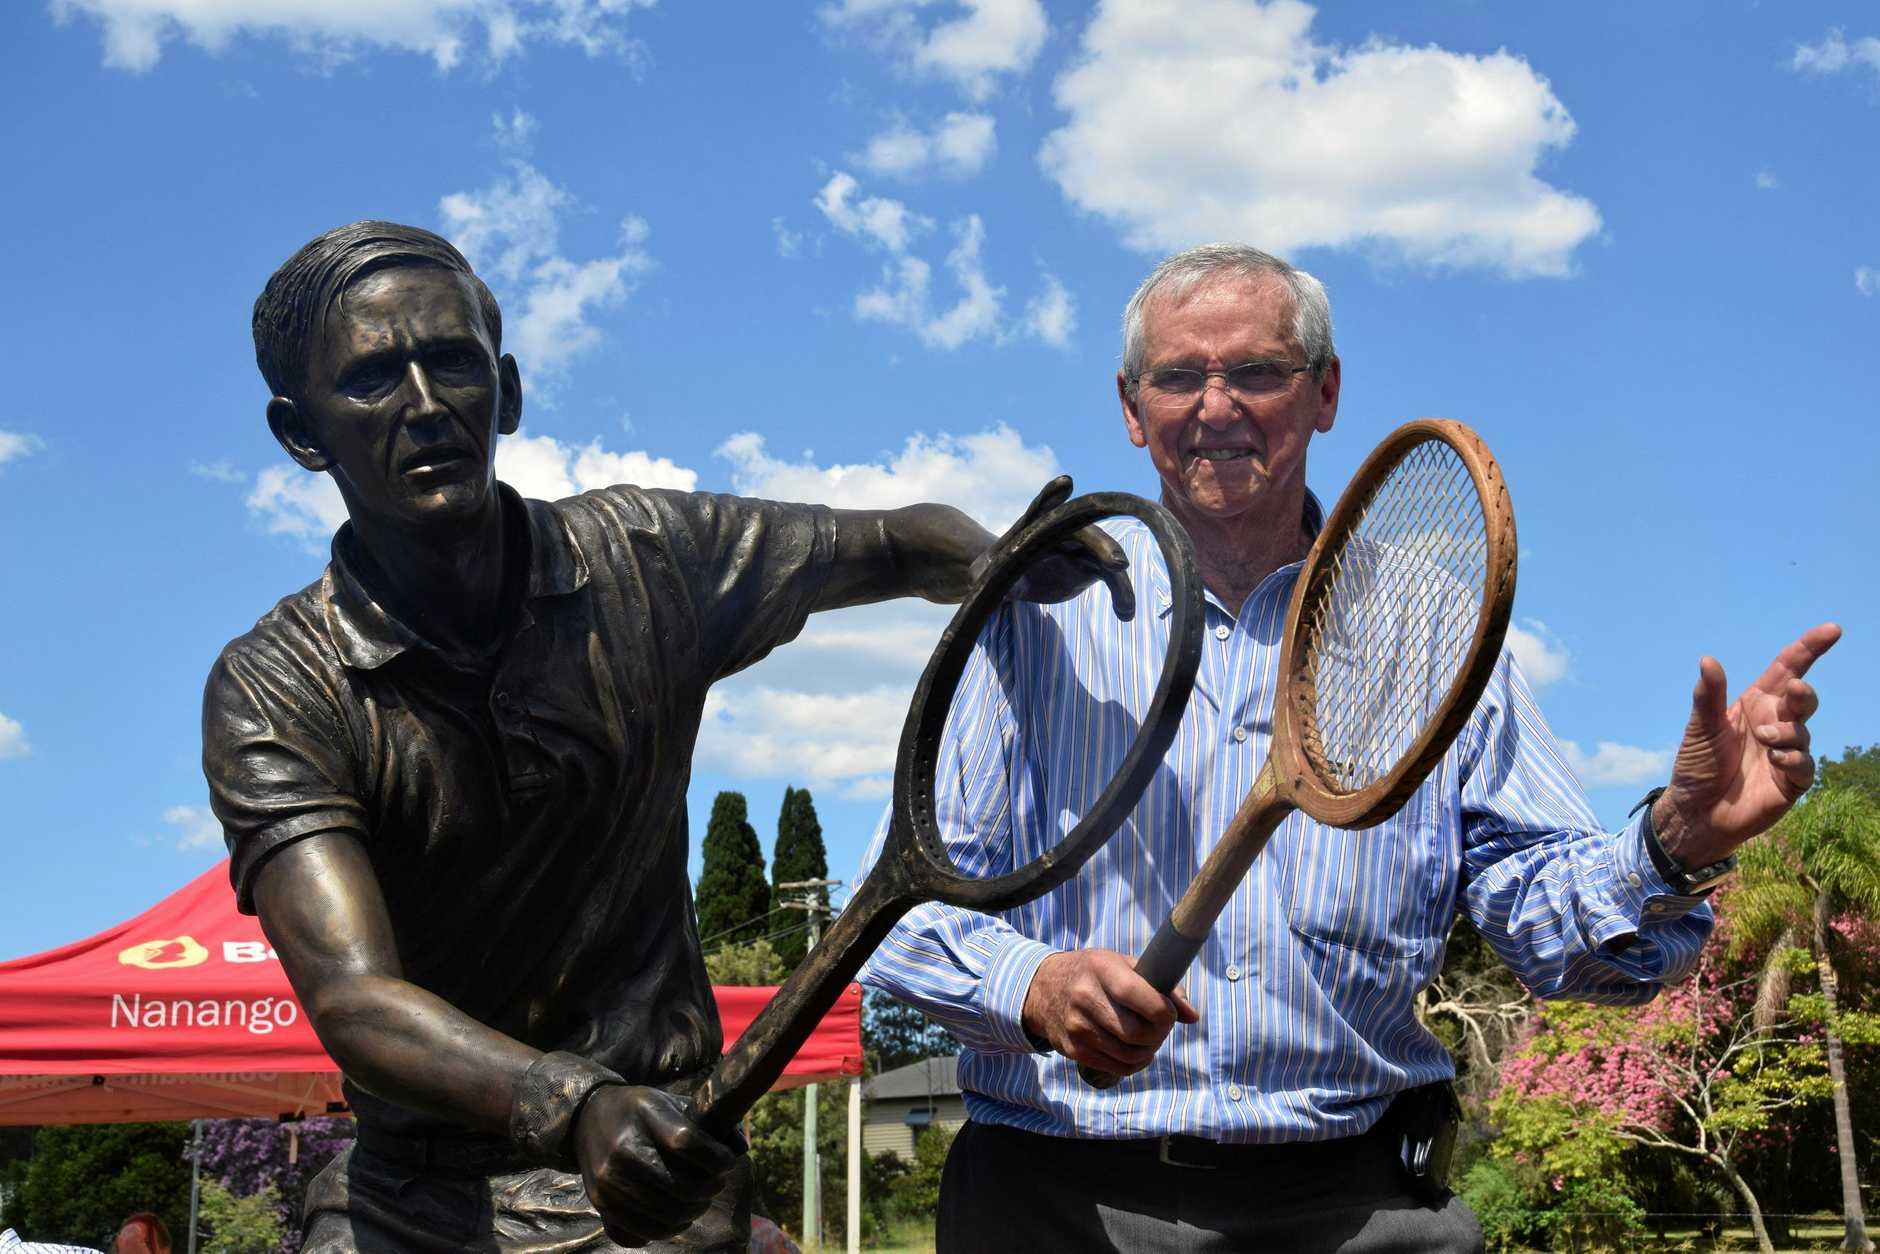 NEW HONOUR: Blackbutt is working towards a new honour for Australian tennis champion Roy Emerson